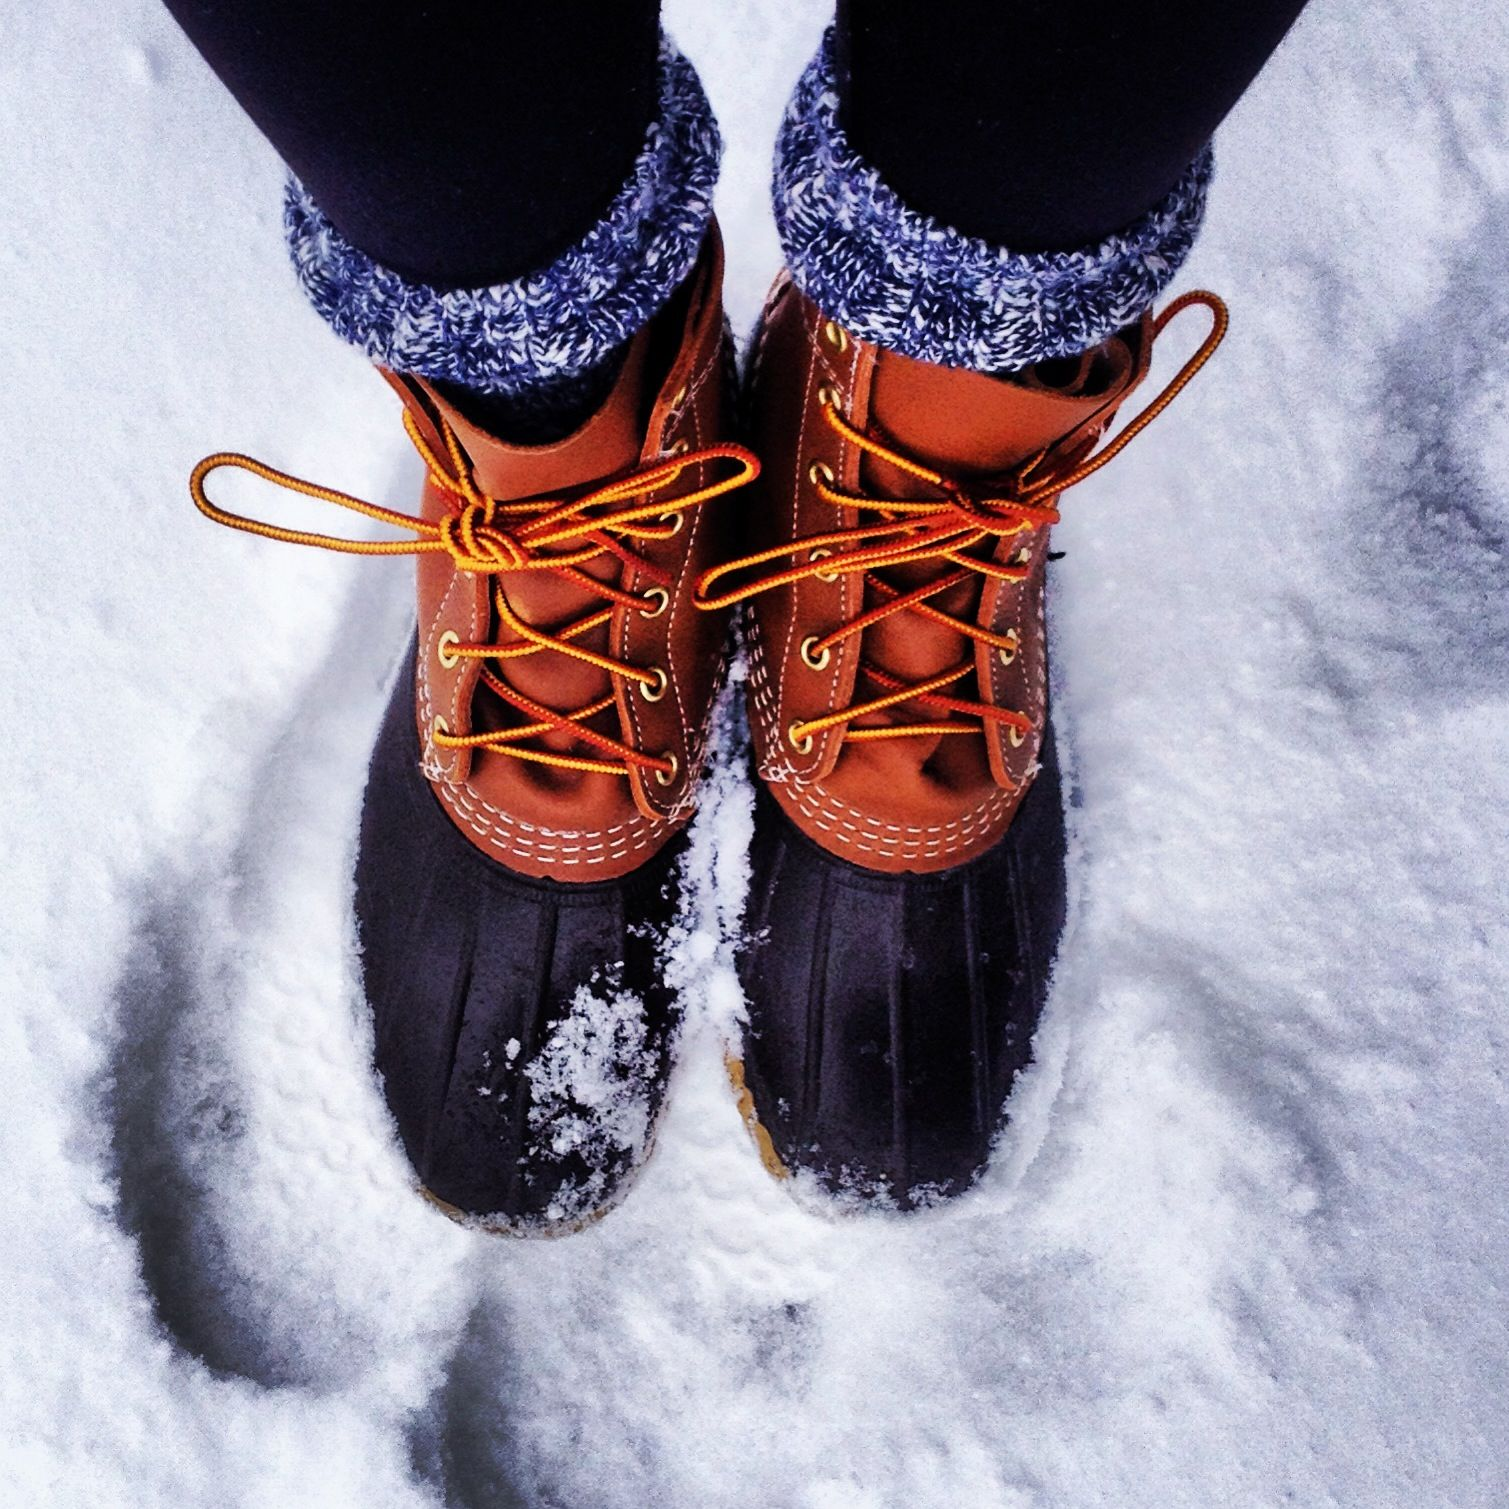 "Women's L.L.Bean Boots, 8"" | Bean boots, Boots, J crew camp"